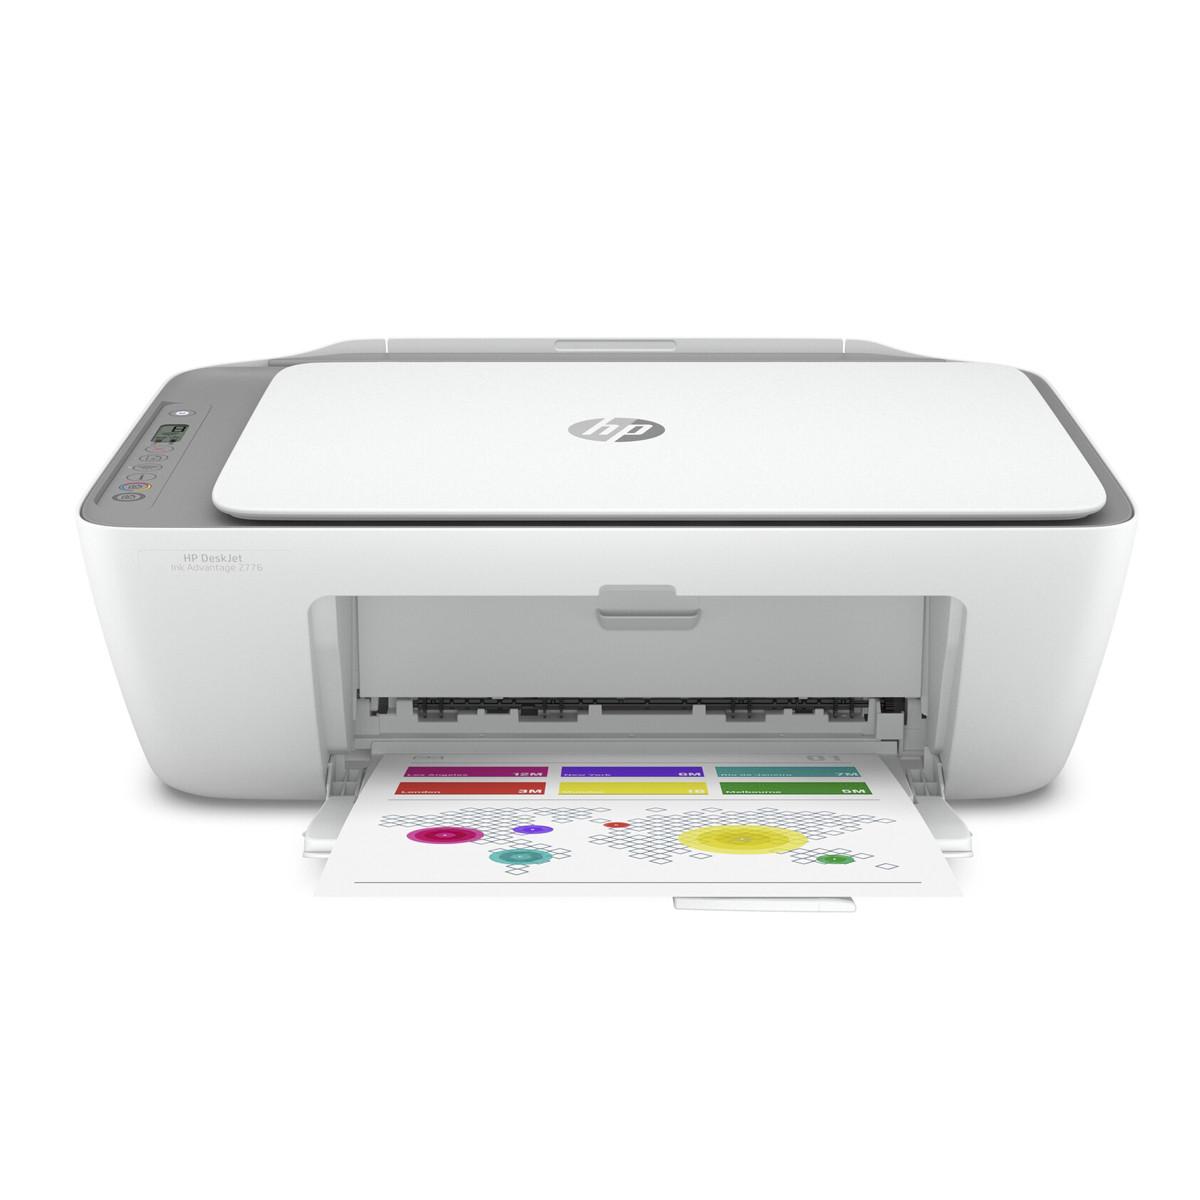 Impressora HP DeskJet 2776 7FR20A Multifuncional Ink Advantage